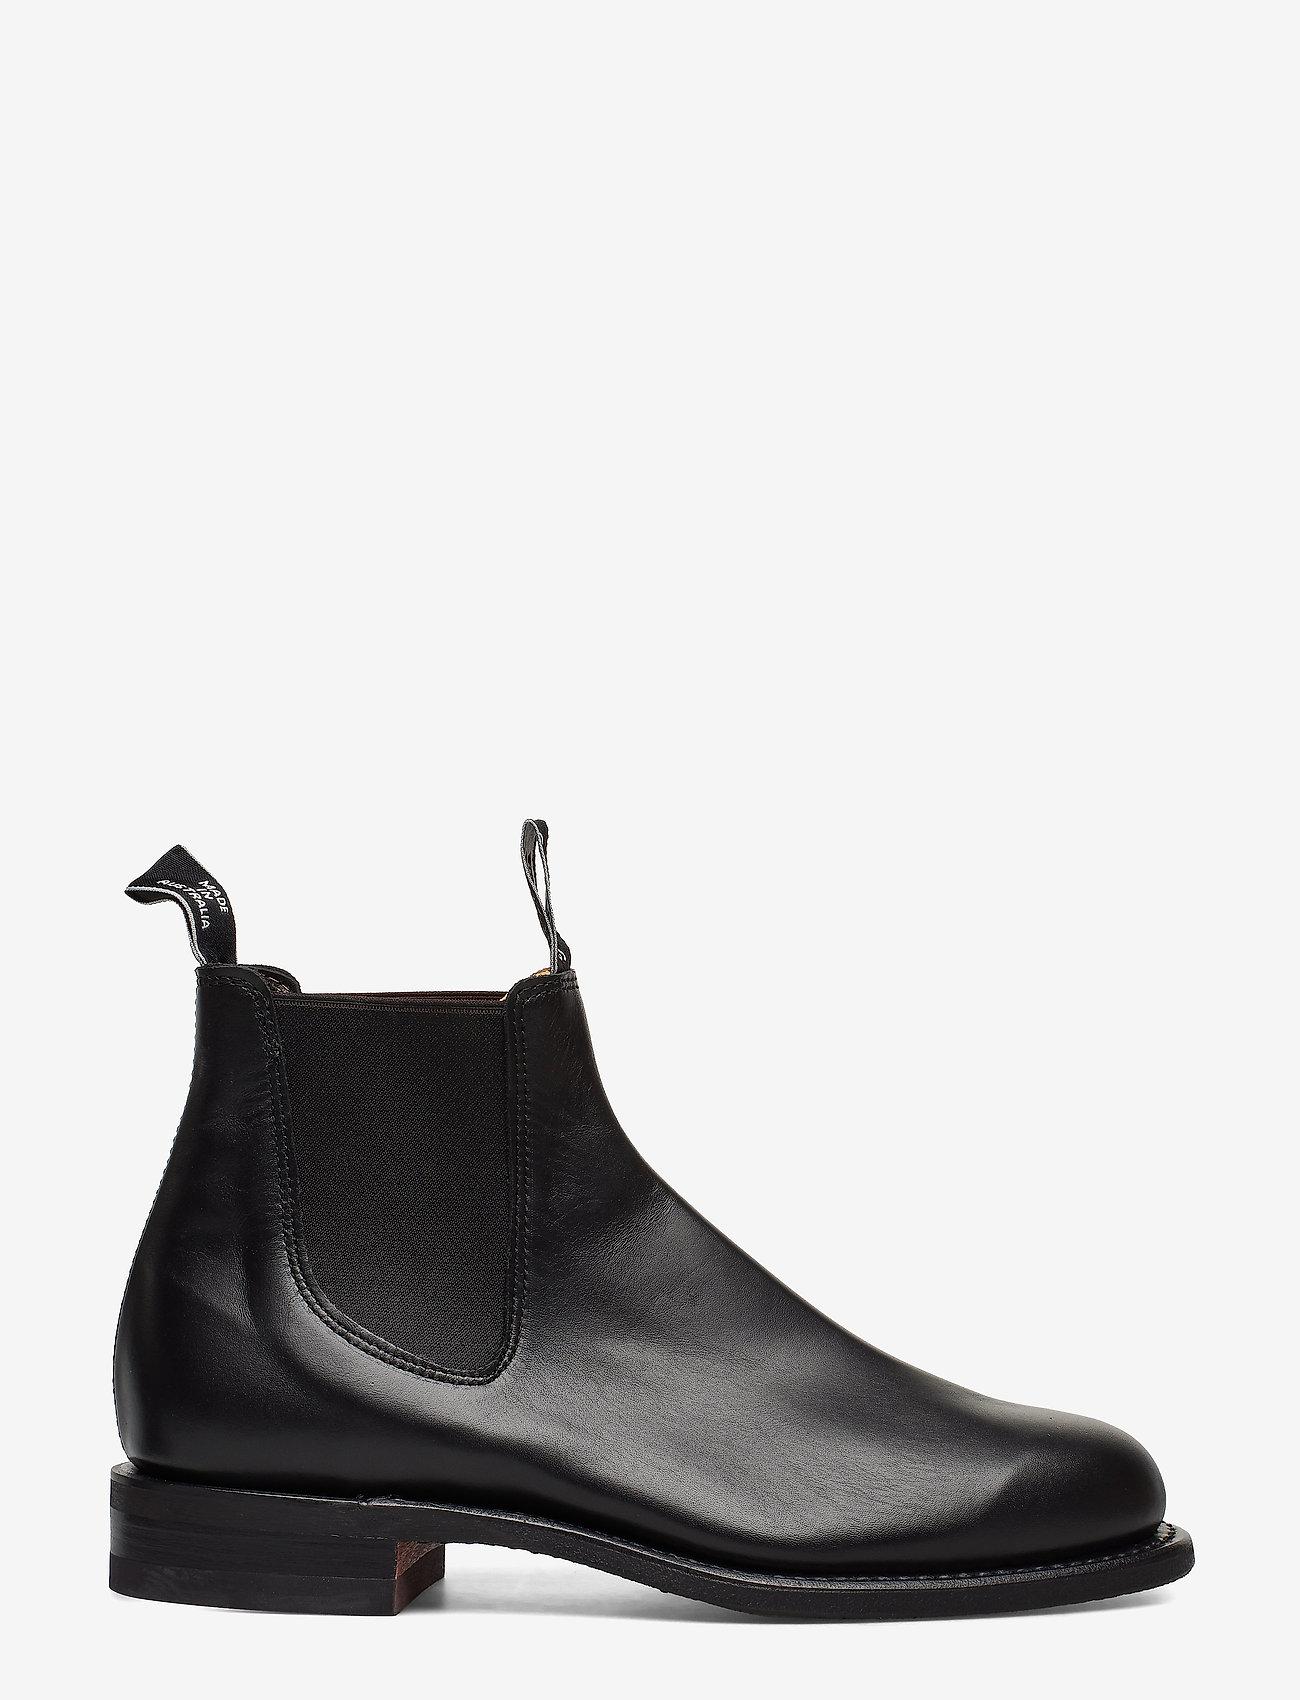 R.M. Williams - Wentworth G-last Yearling Black - støvler - black - 0